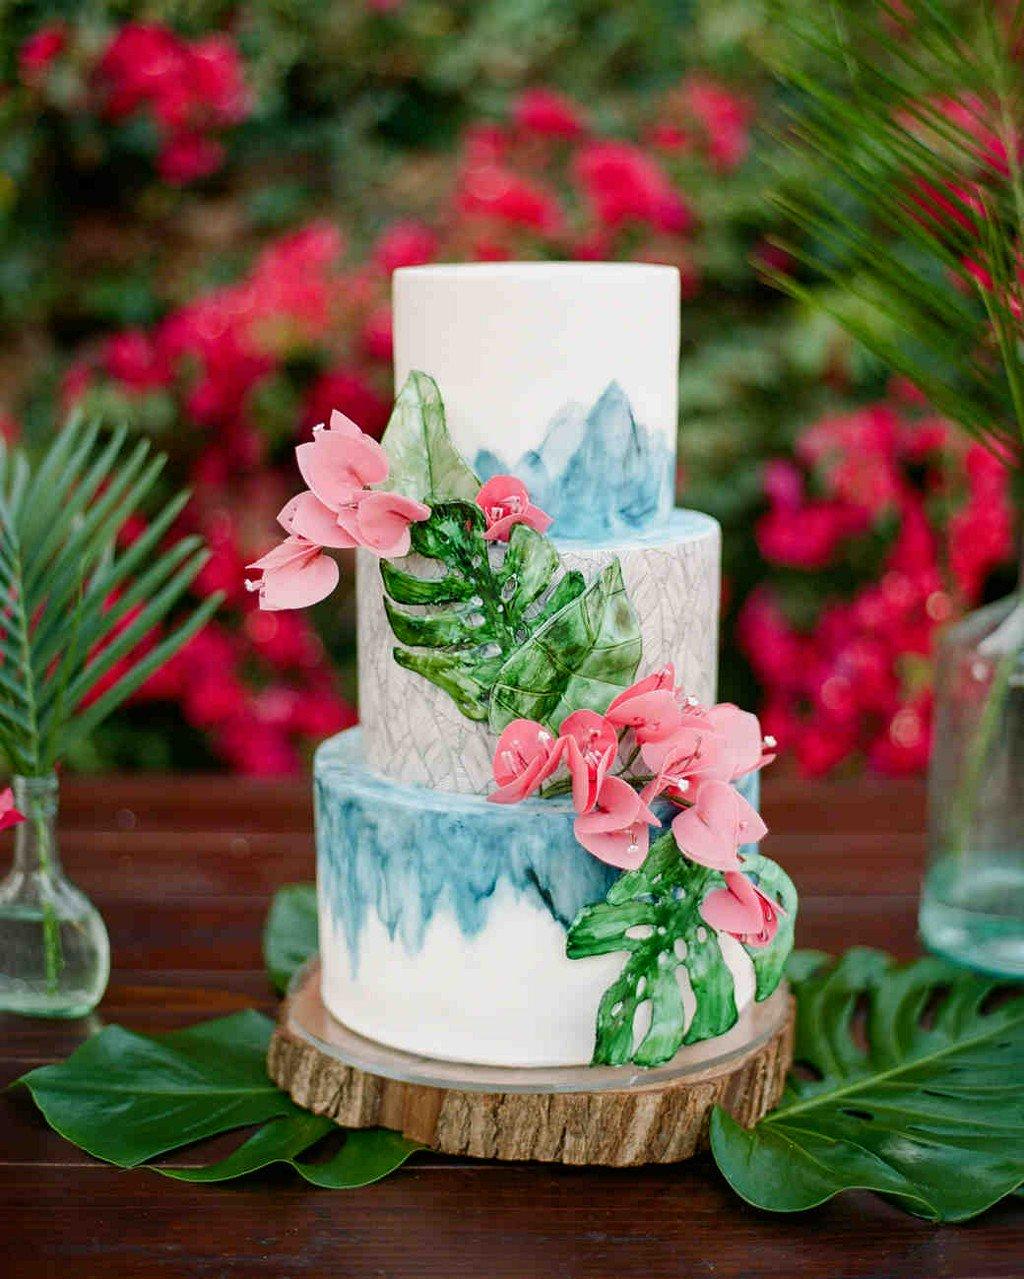 22 Summer Wedding Cakes That Speak to the Season https://t.co/3TSzMw8EJT https://t.co/gvTcYph4lS